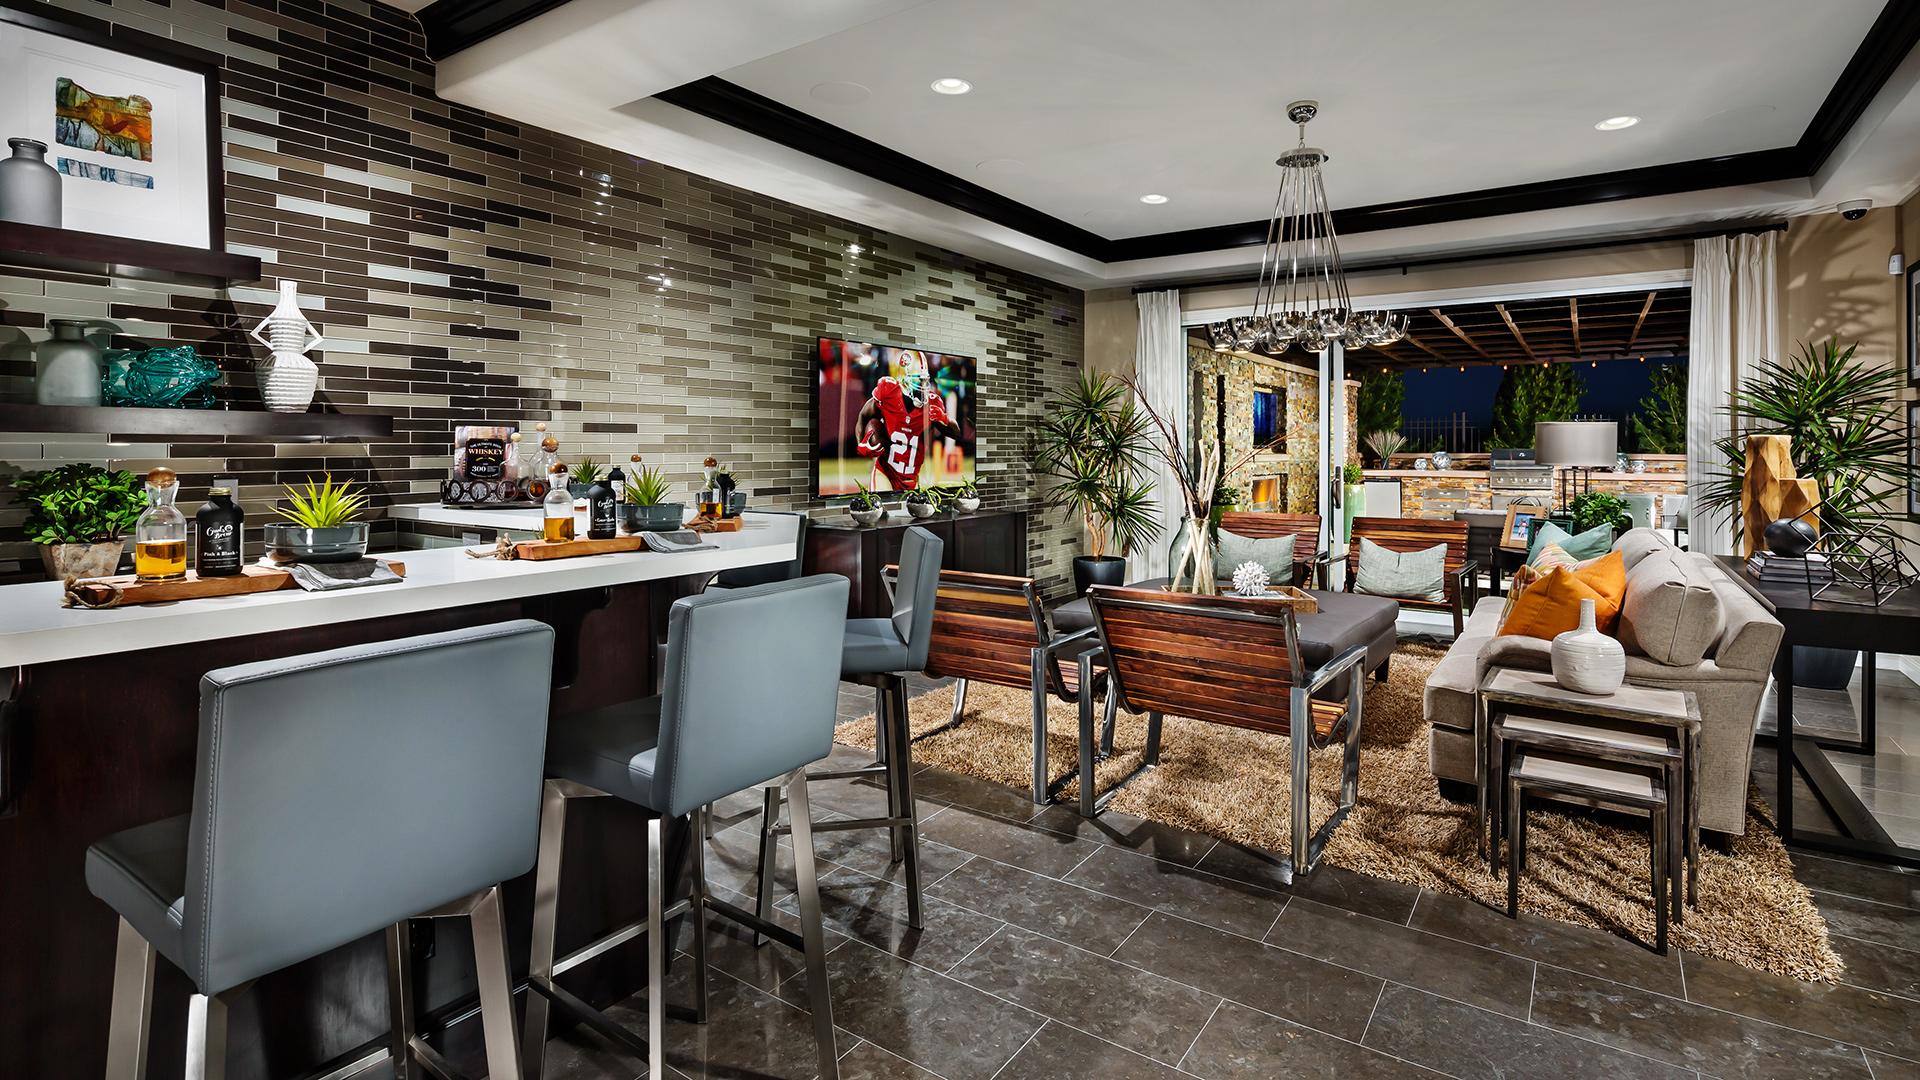 The Montecito Family Room